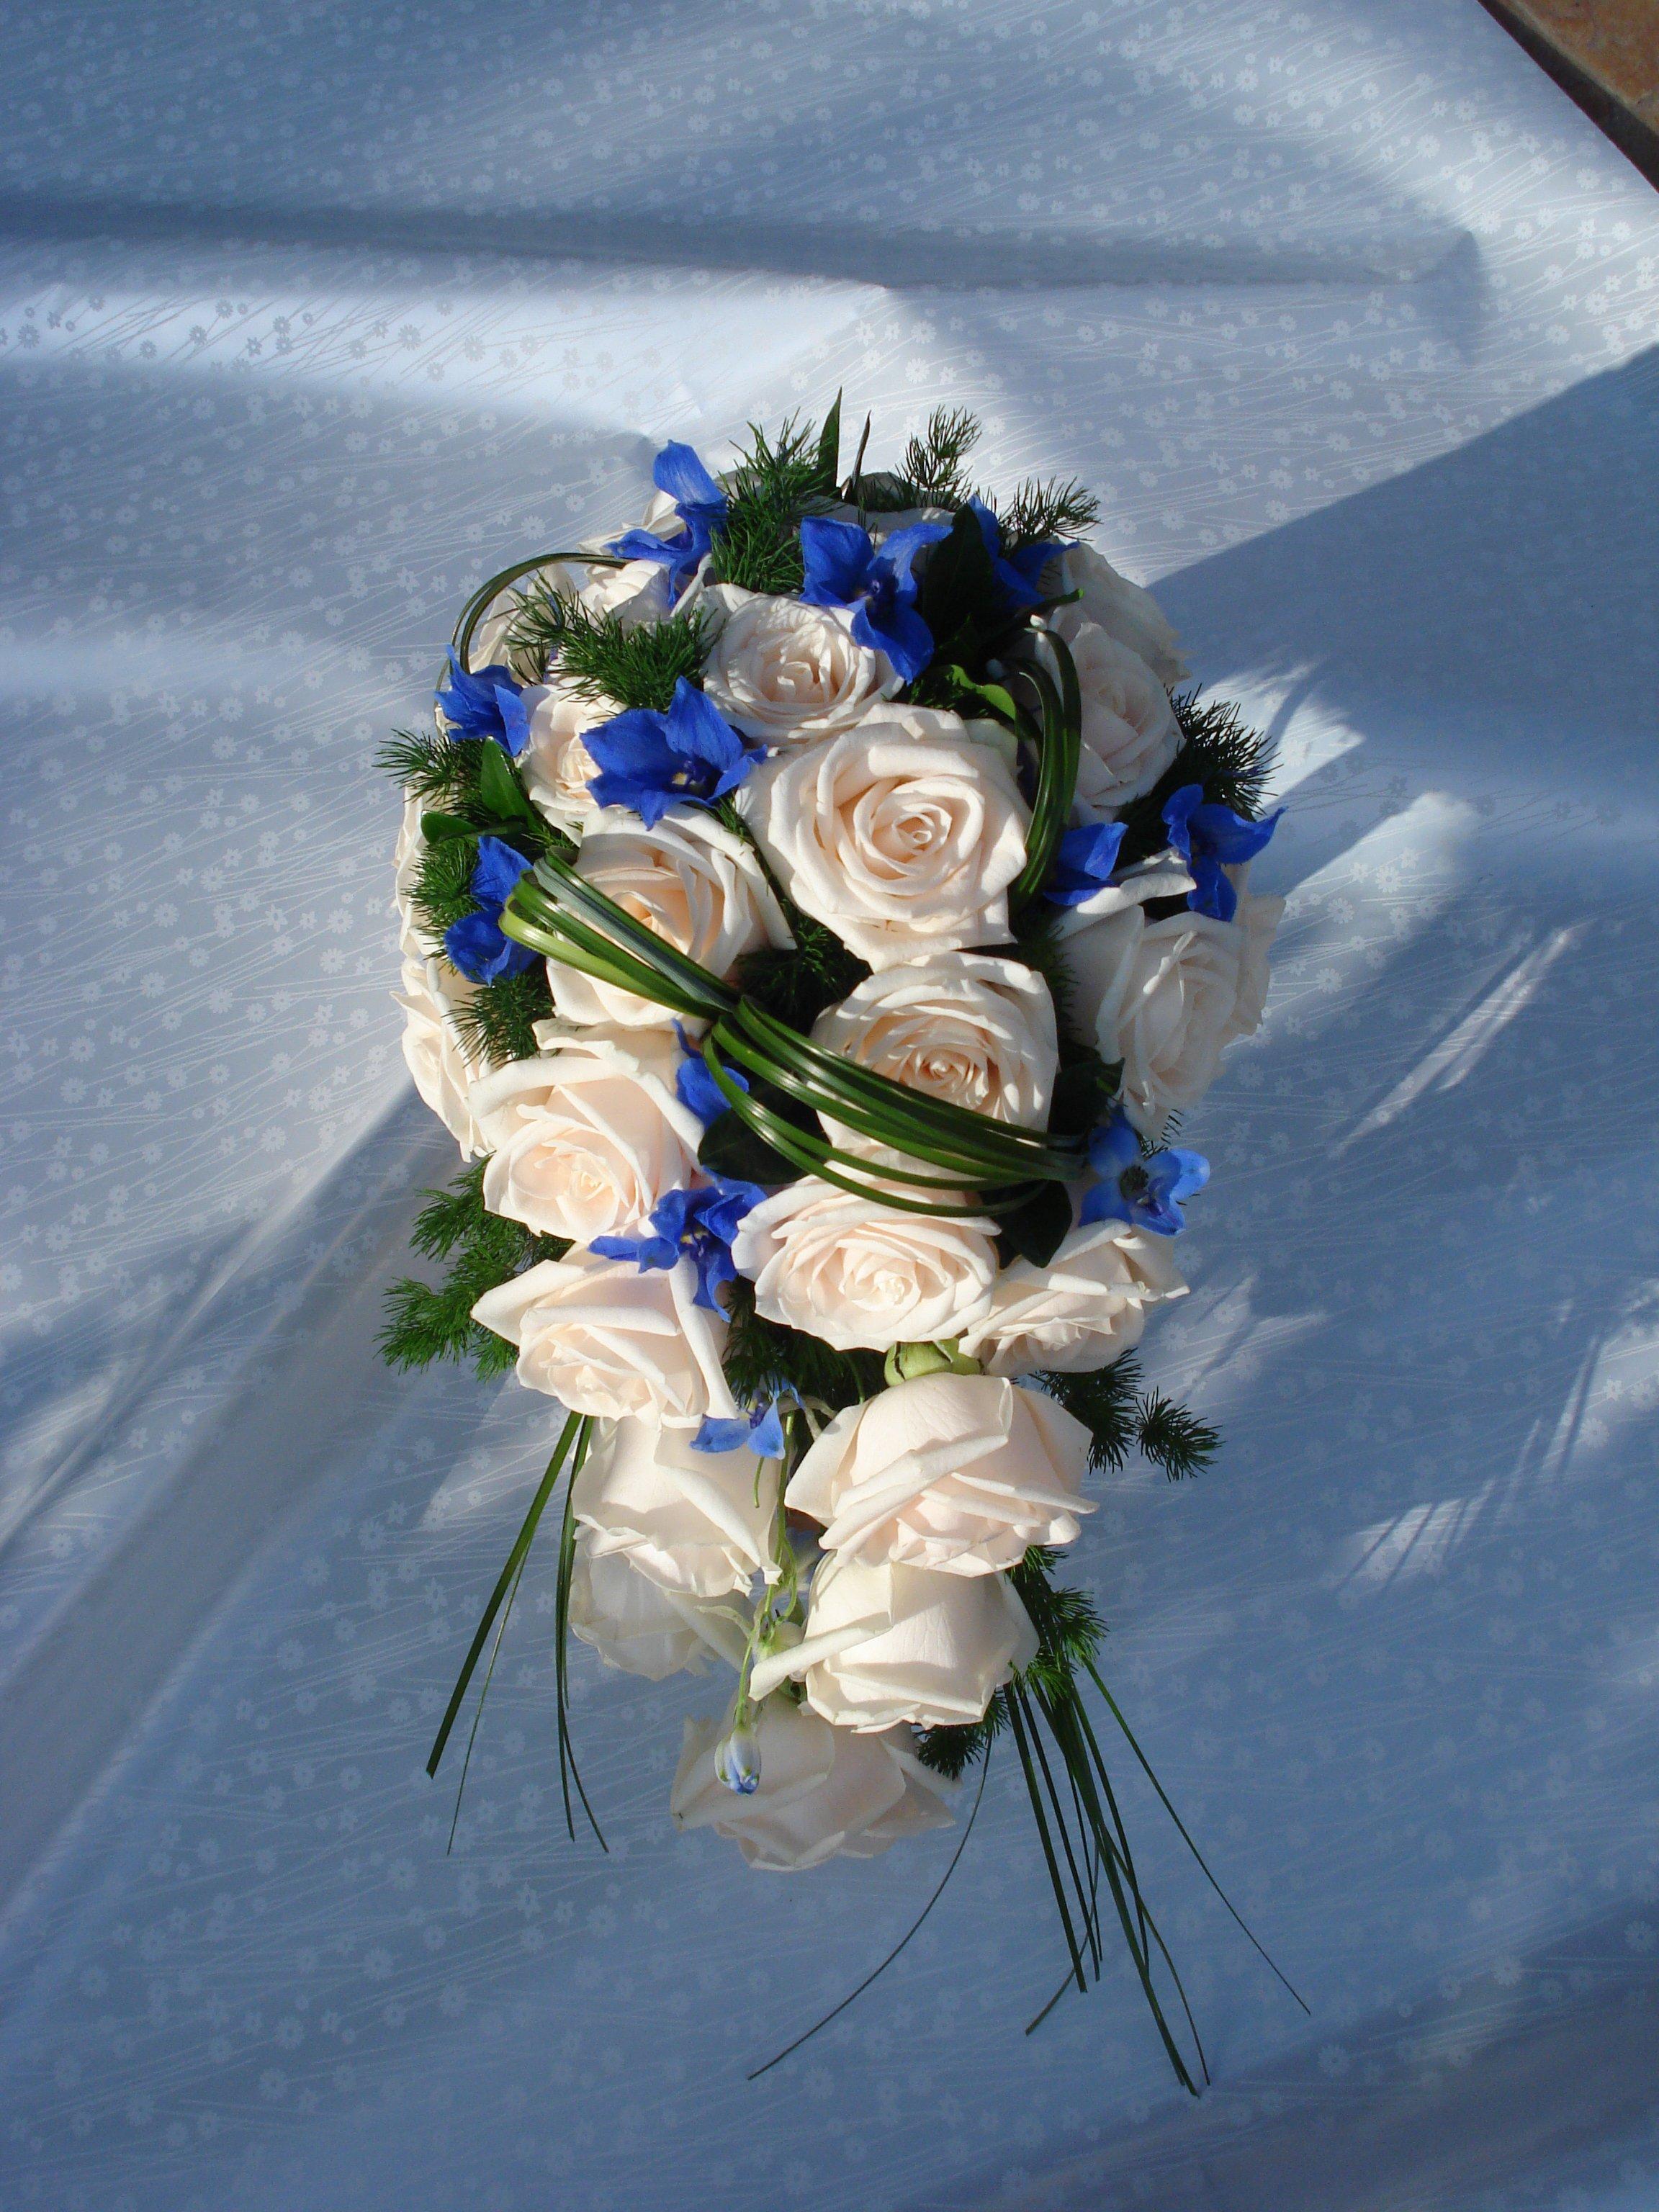 bouquet rose vandela delphinium belladonna e bergrass